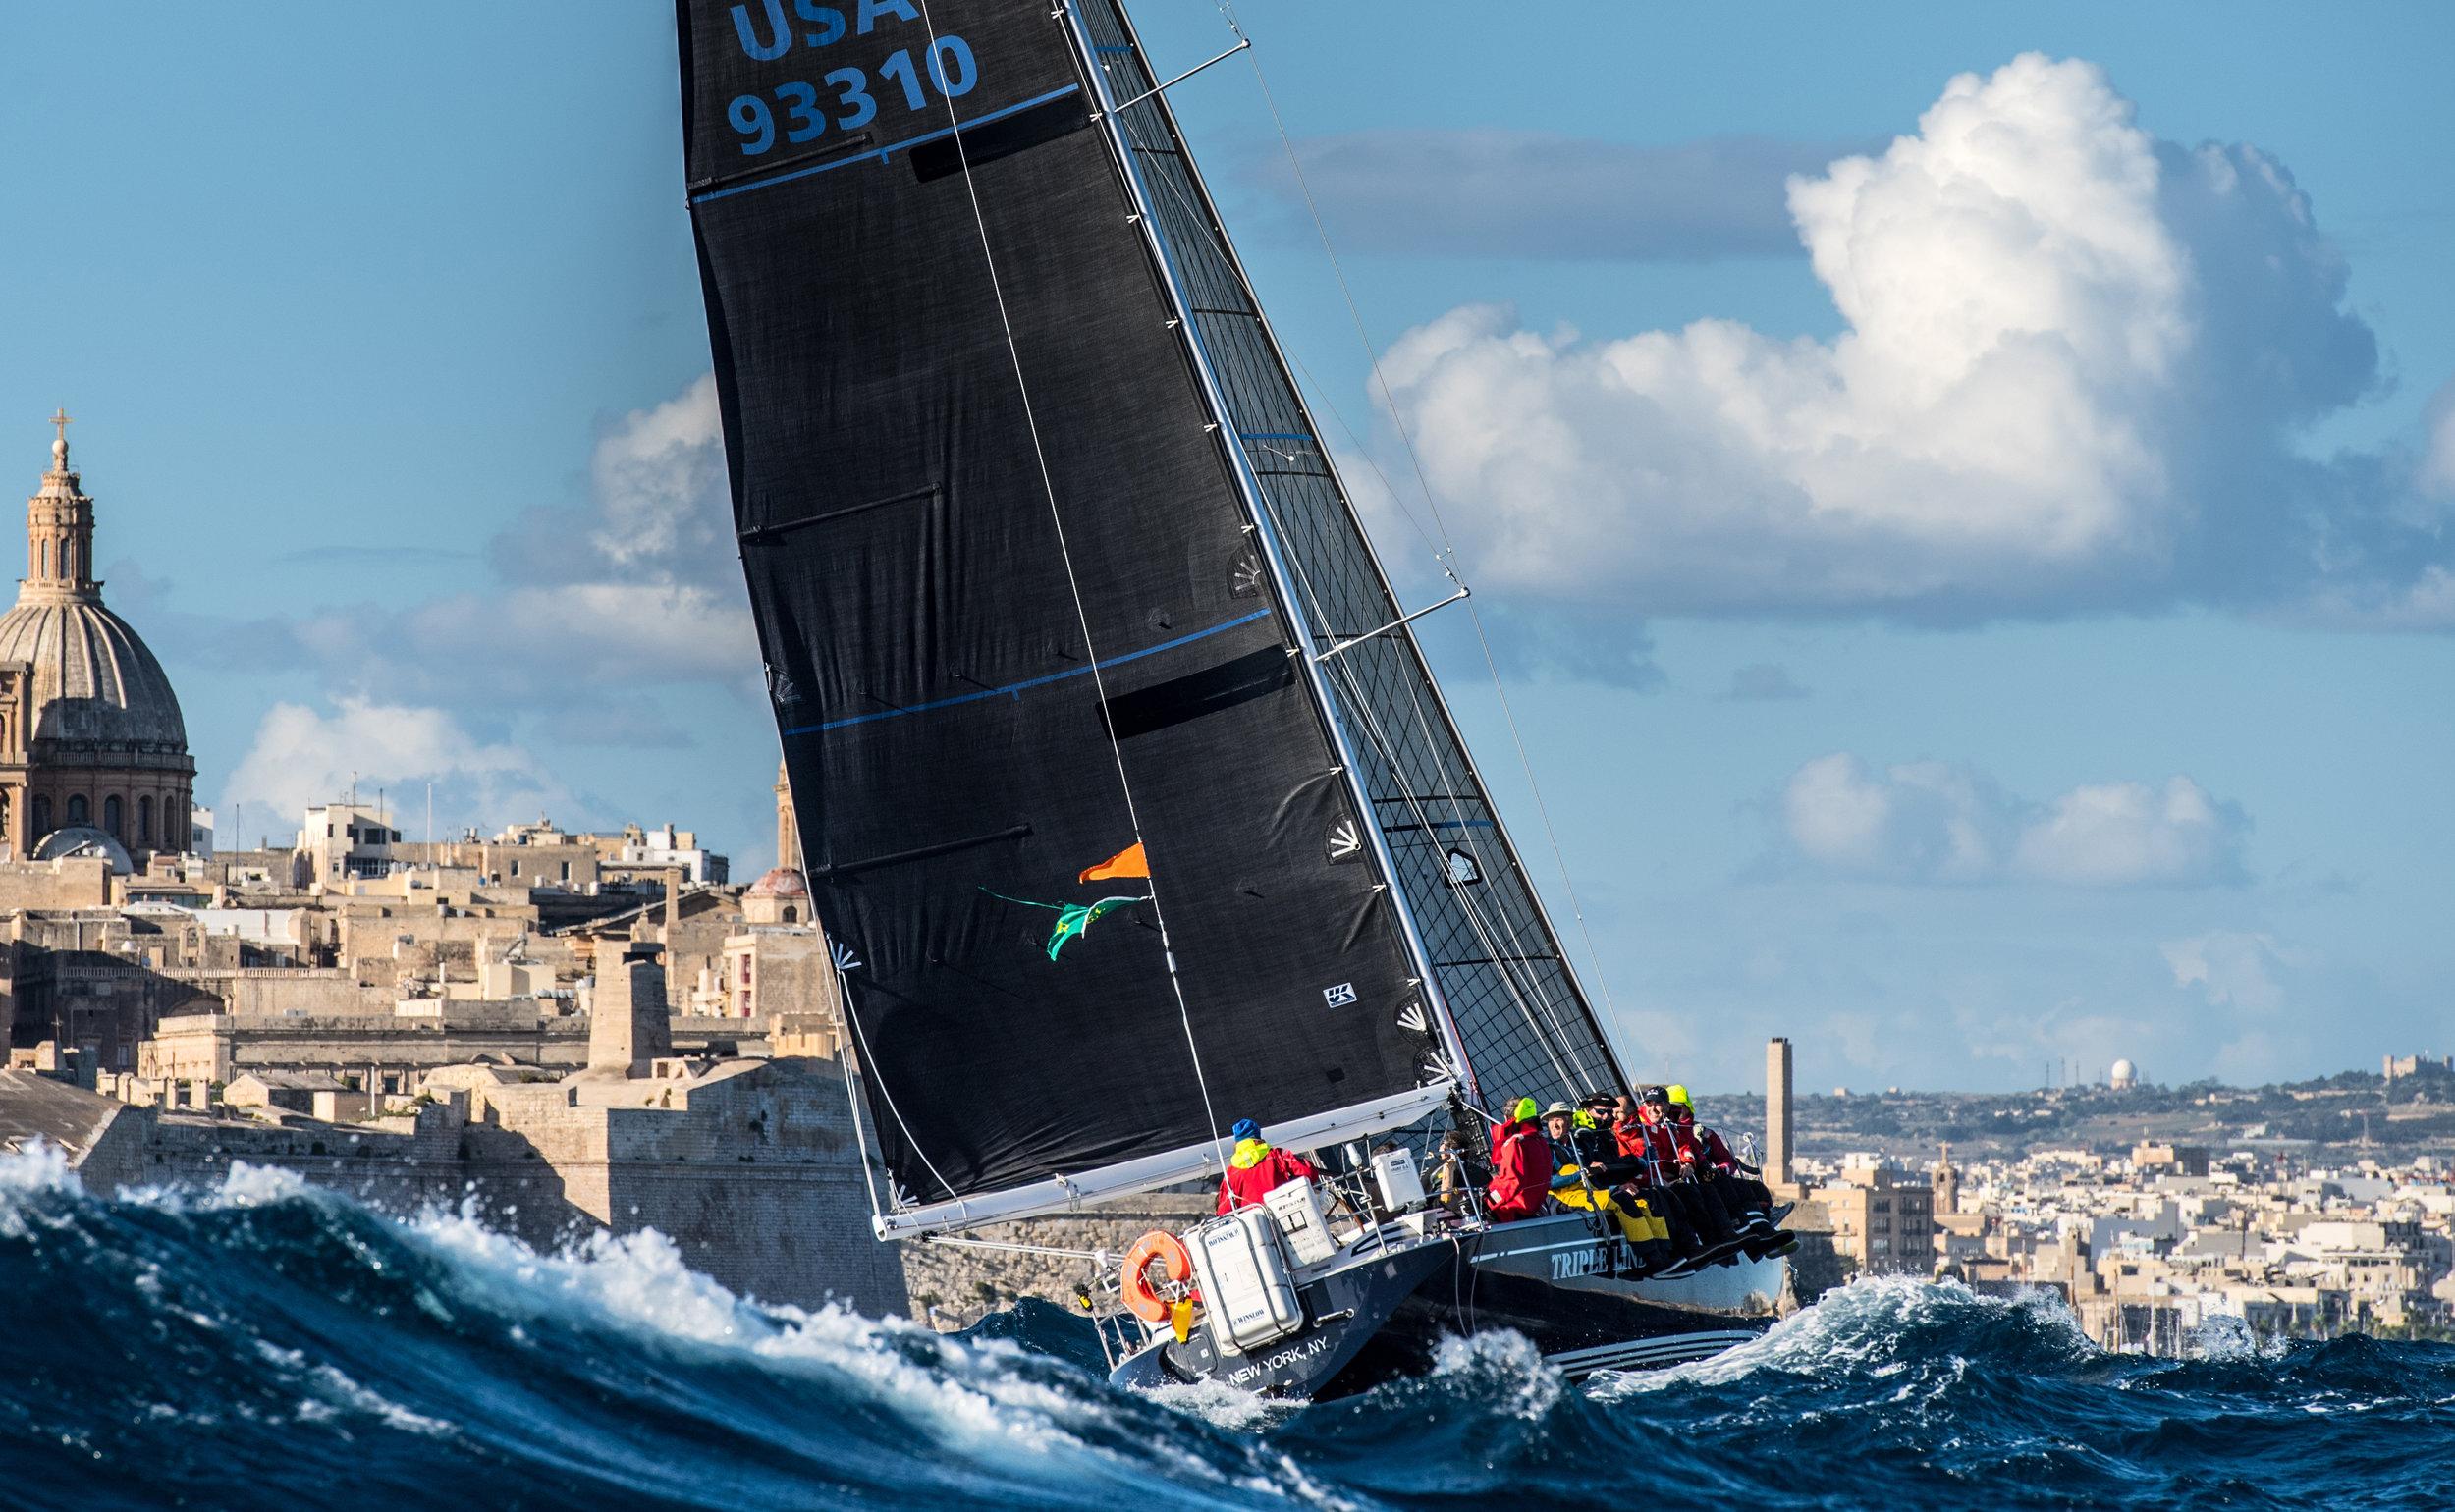 Photo of TRIPLE LINDY finishing the 2017 Rolex Middle Sea Race courtesy of Rolex/Kurt Arrigo.